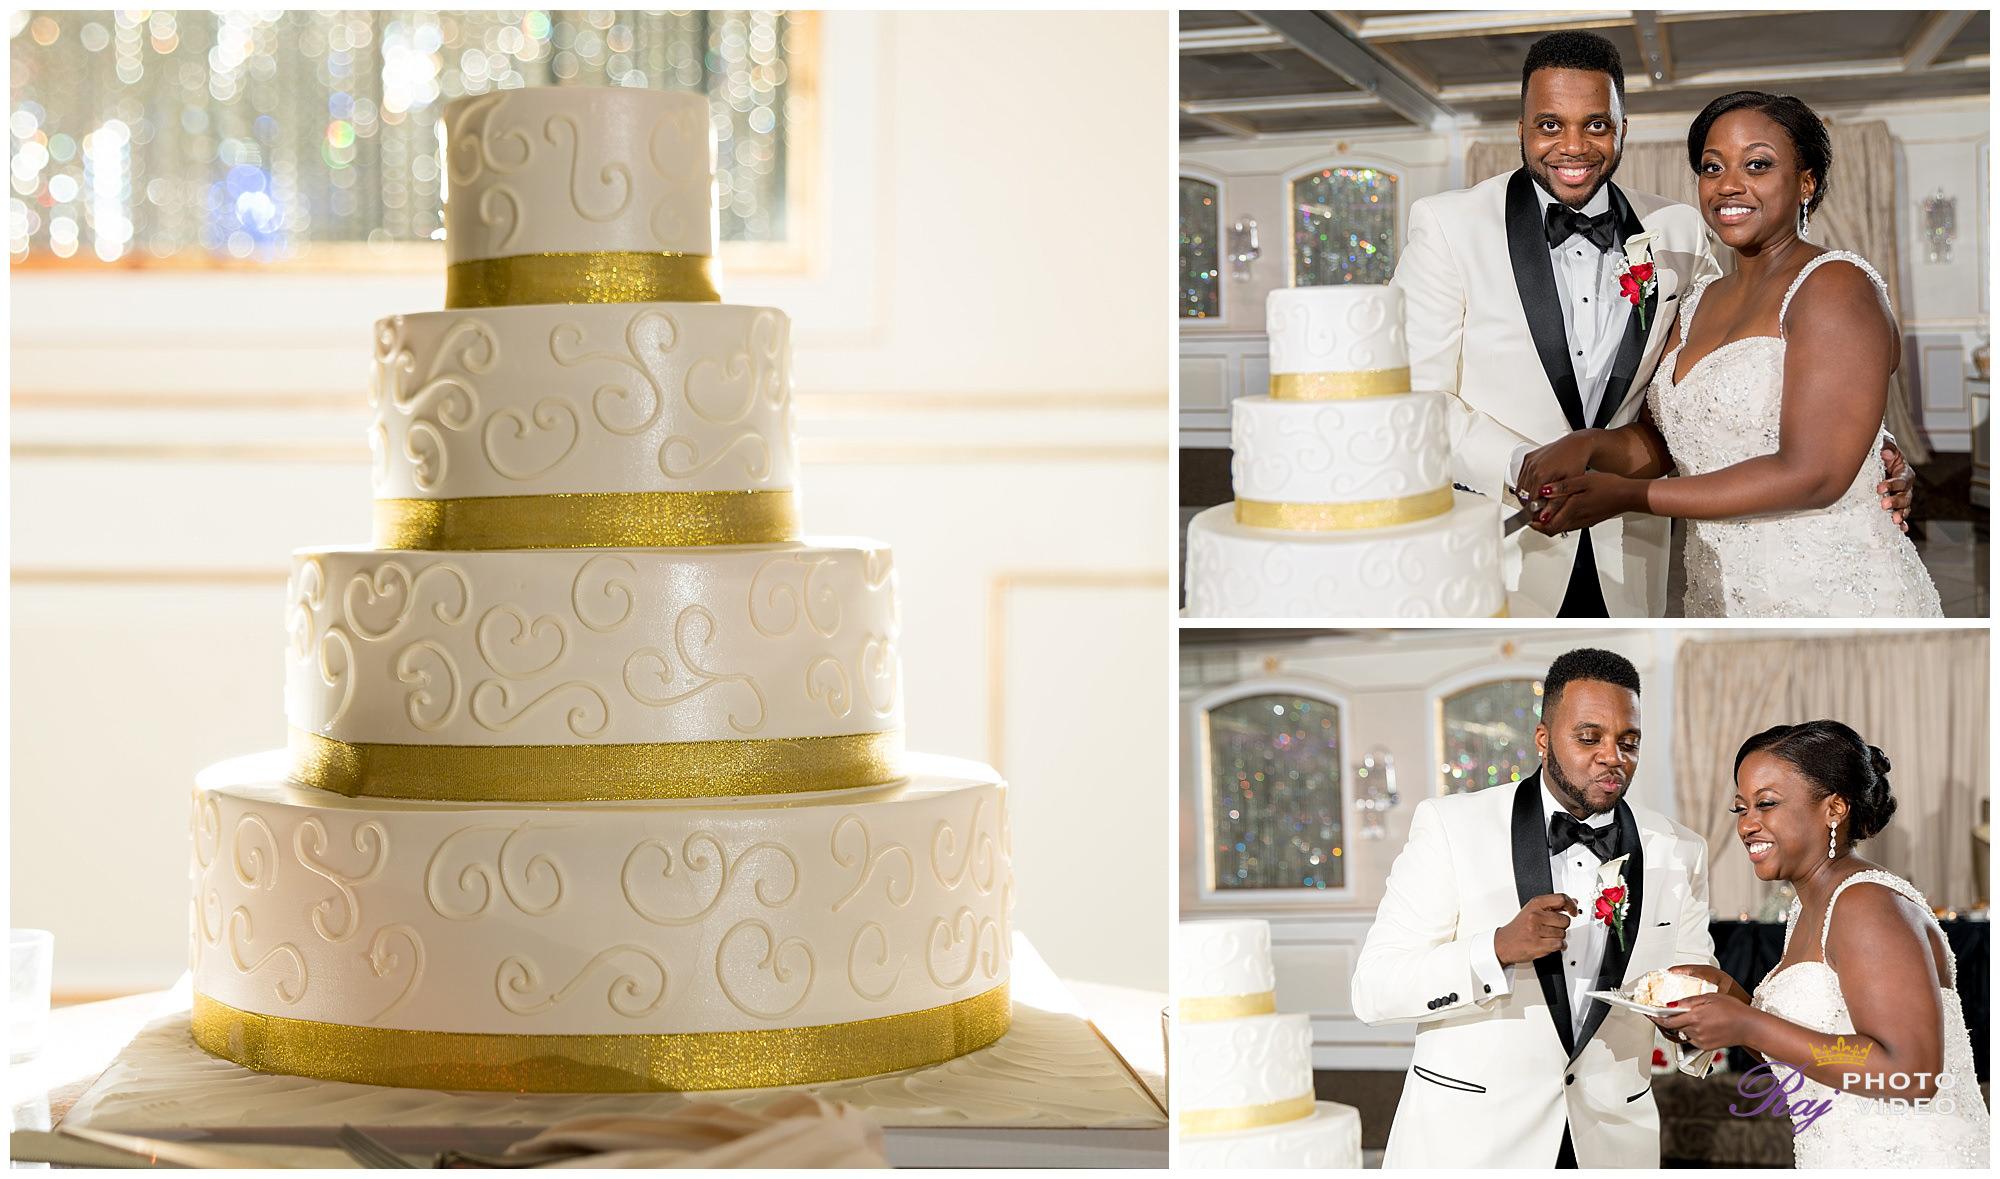 Royal_Manor_Garfield_NJ_Christian_Wedding_Jade_Scott-0026.jpg